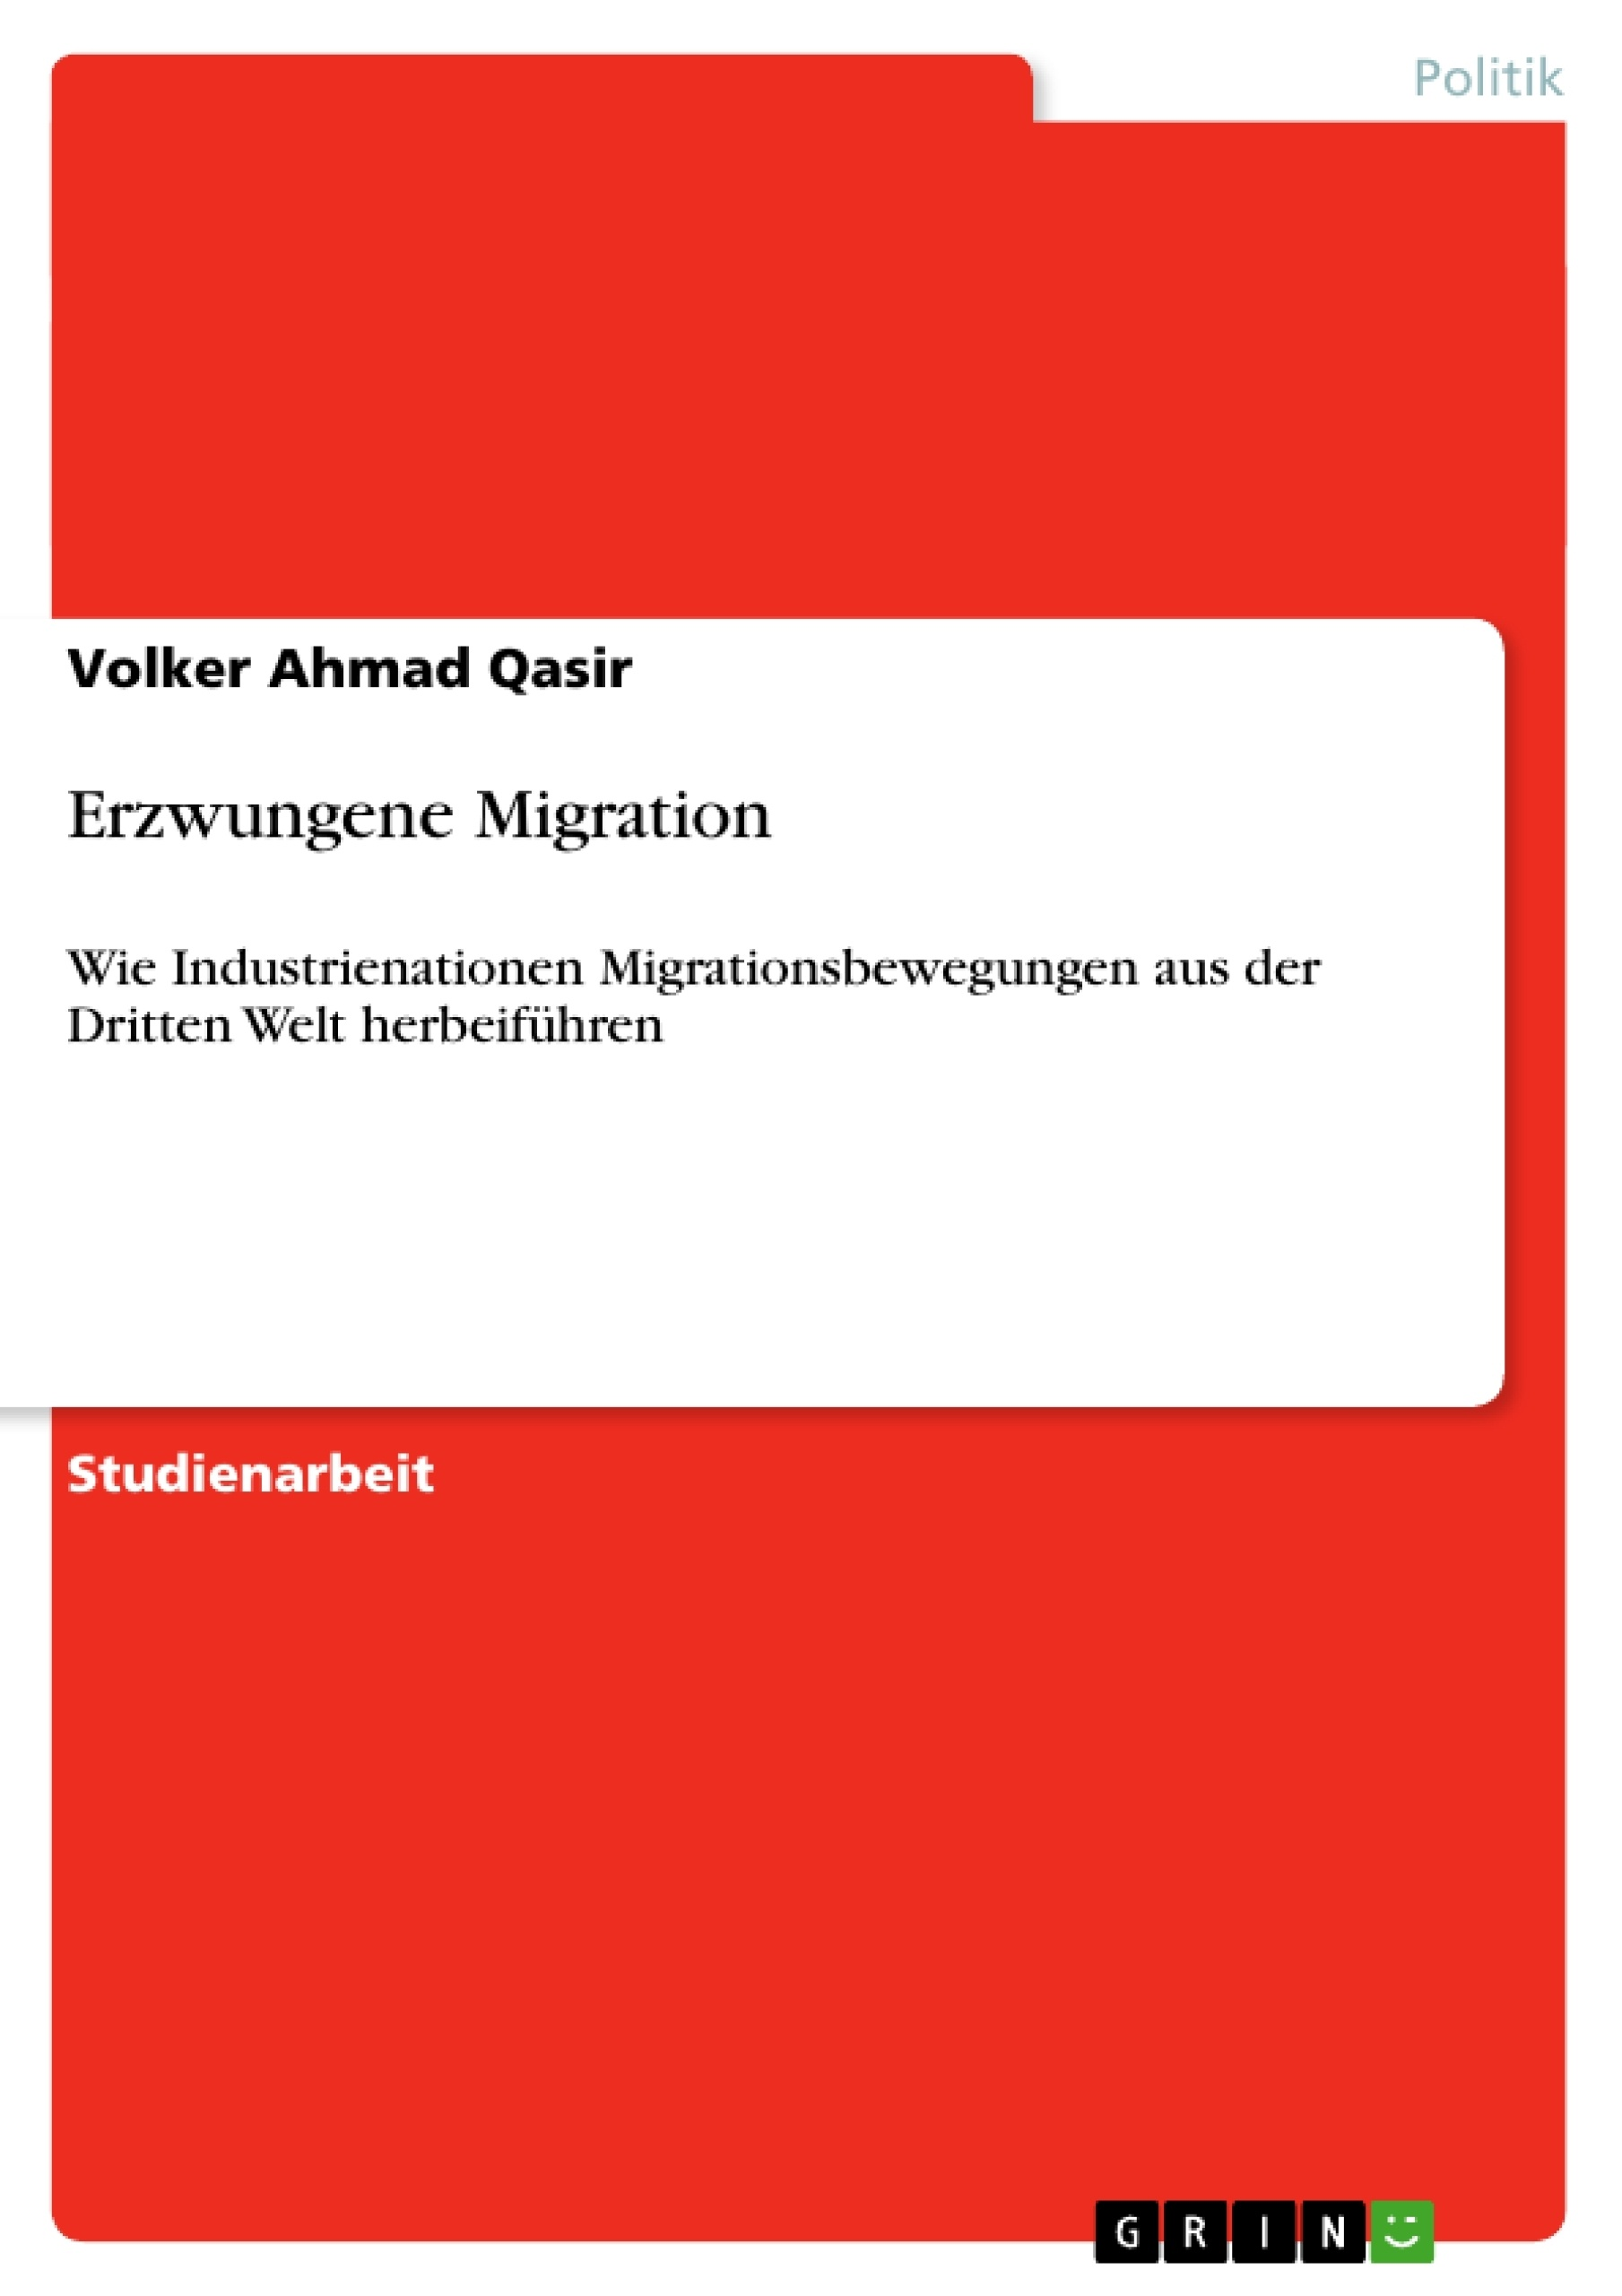 Titel: Erzwungene Migration